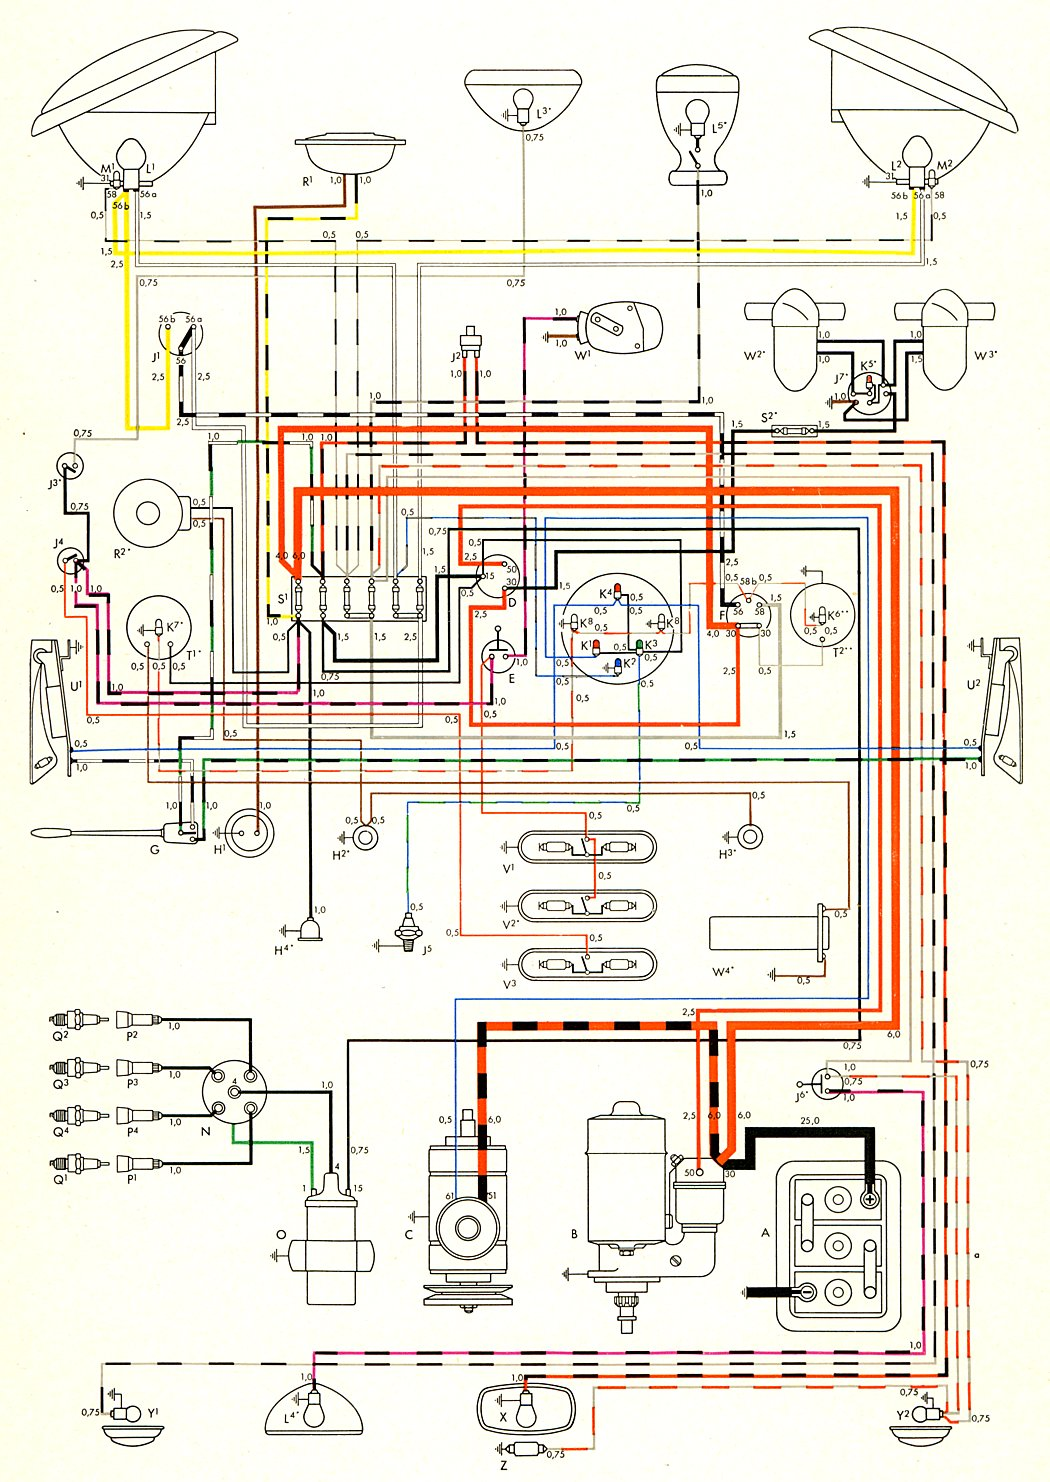 Vw Bus Engine Diagram Wiring Schematic Auto Electrical 1978 Thesamba Com Type 2 Diagrams